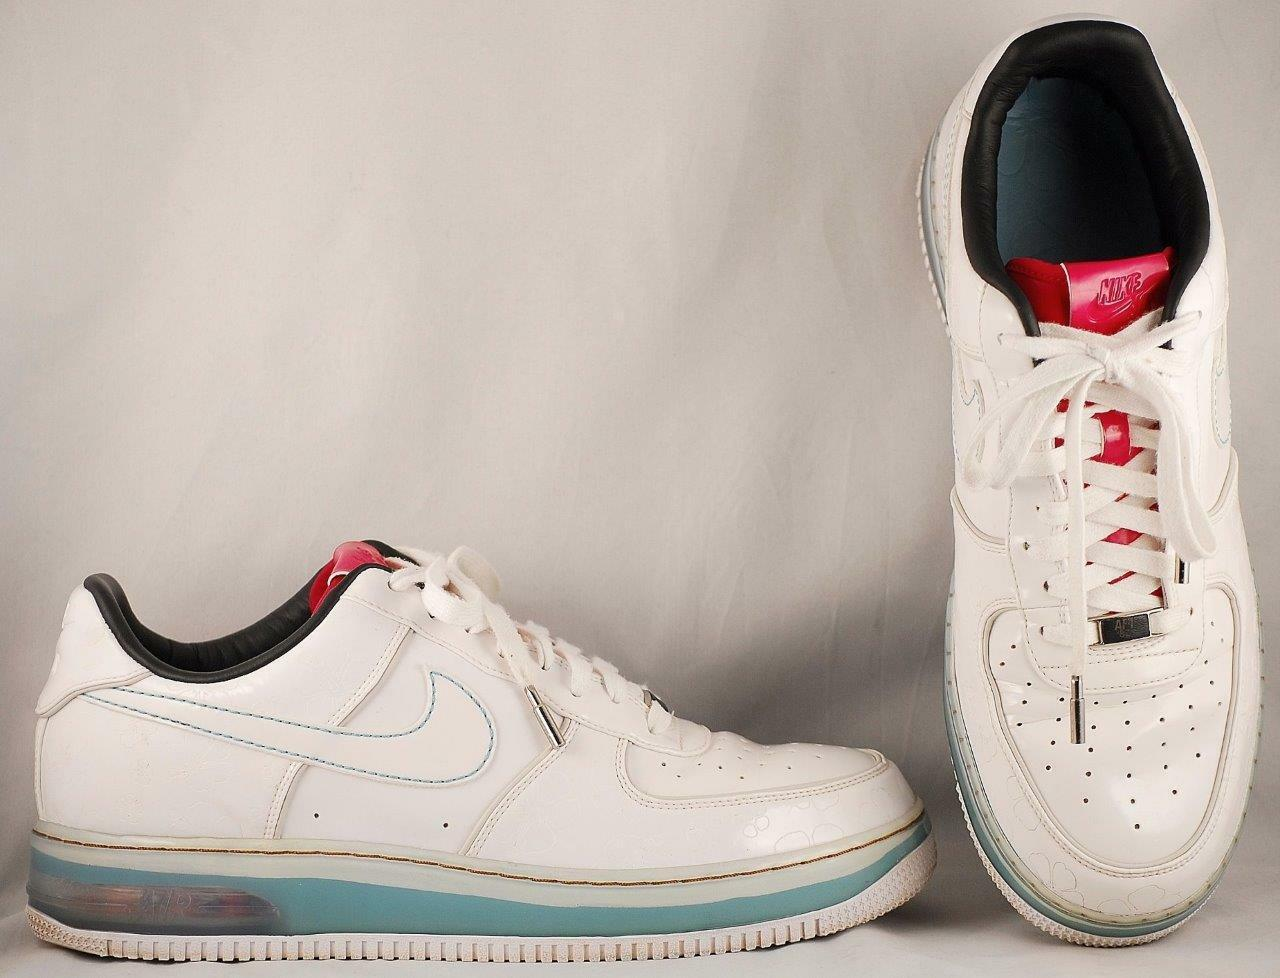 Men's Nike White Air Force XXV Sneakers US 12